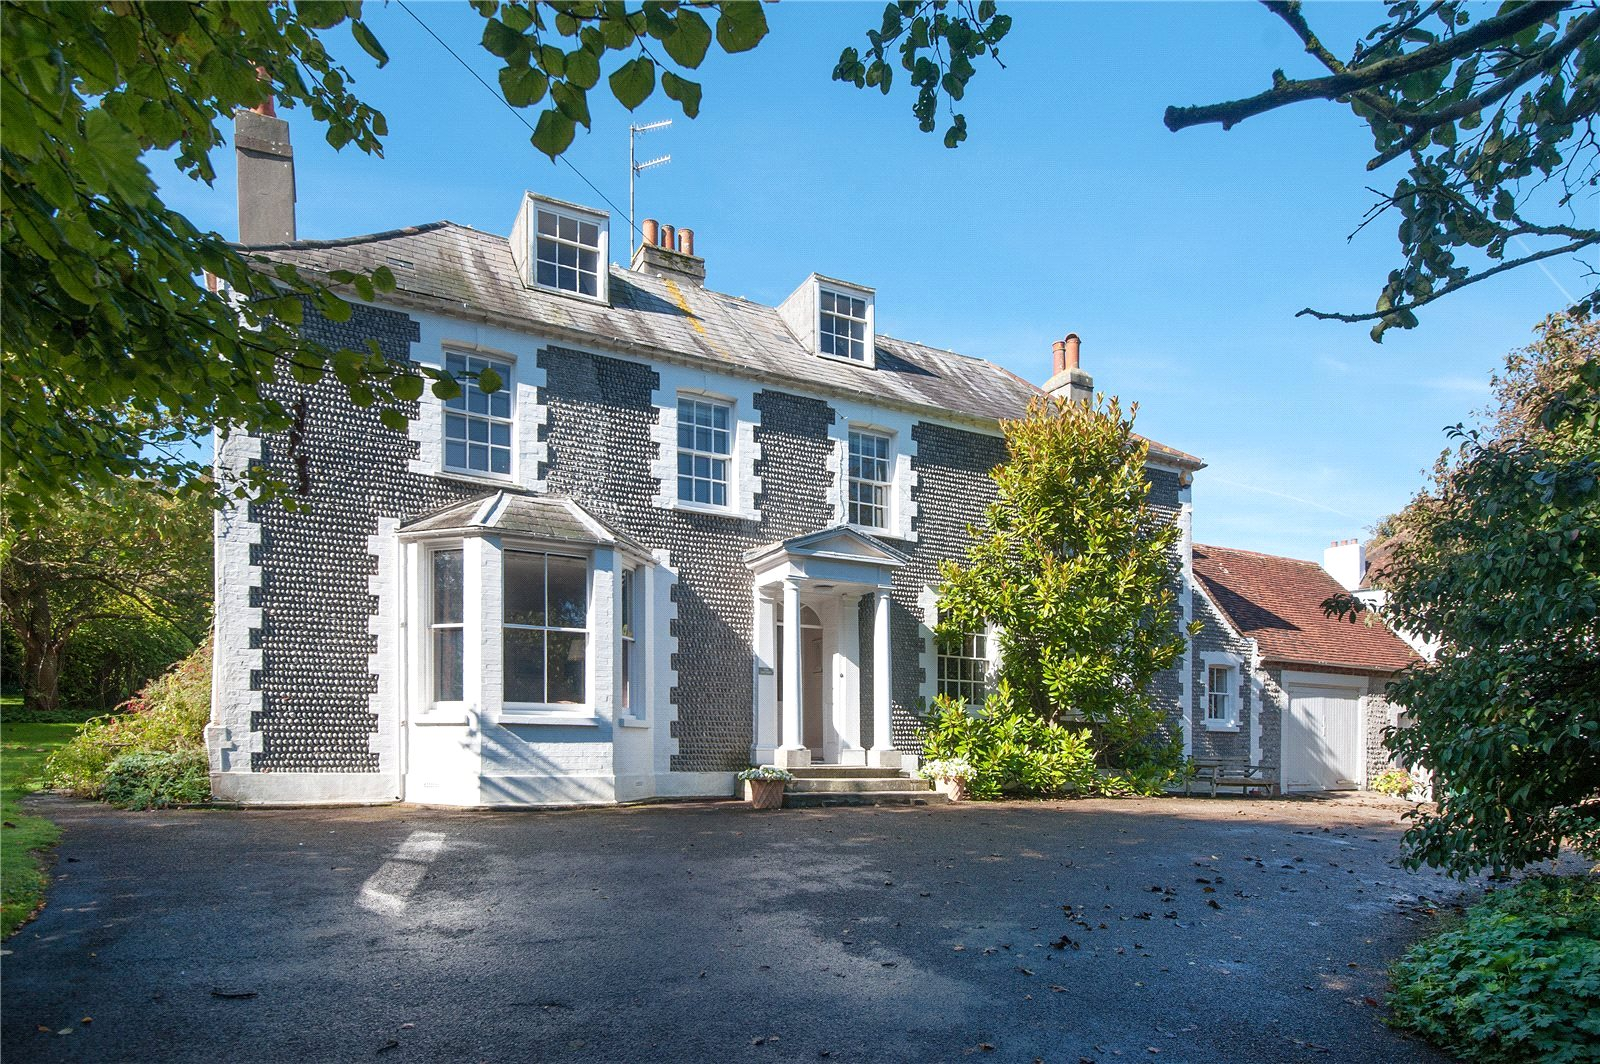 Single Family Home for Sale at Greenways, Ovingdean, Brighton, BN2 Brighton, England